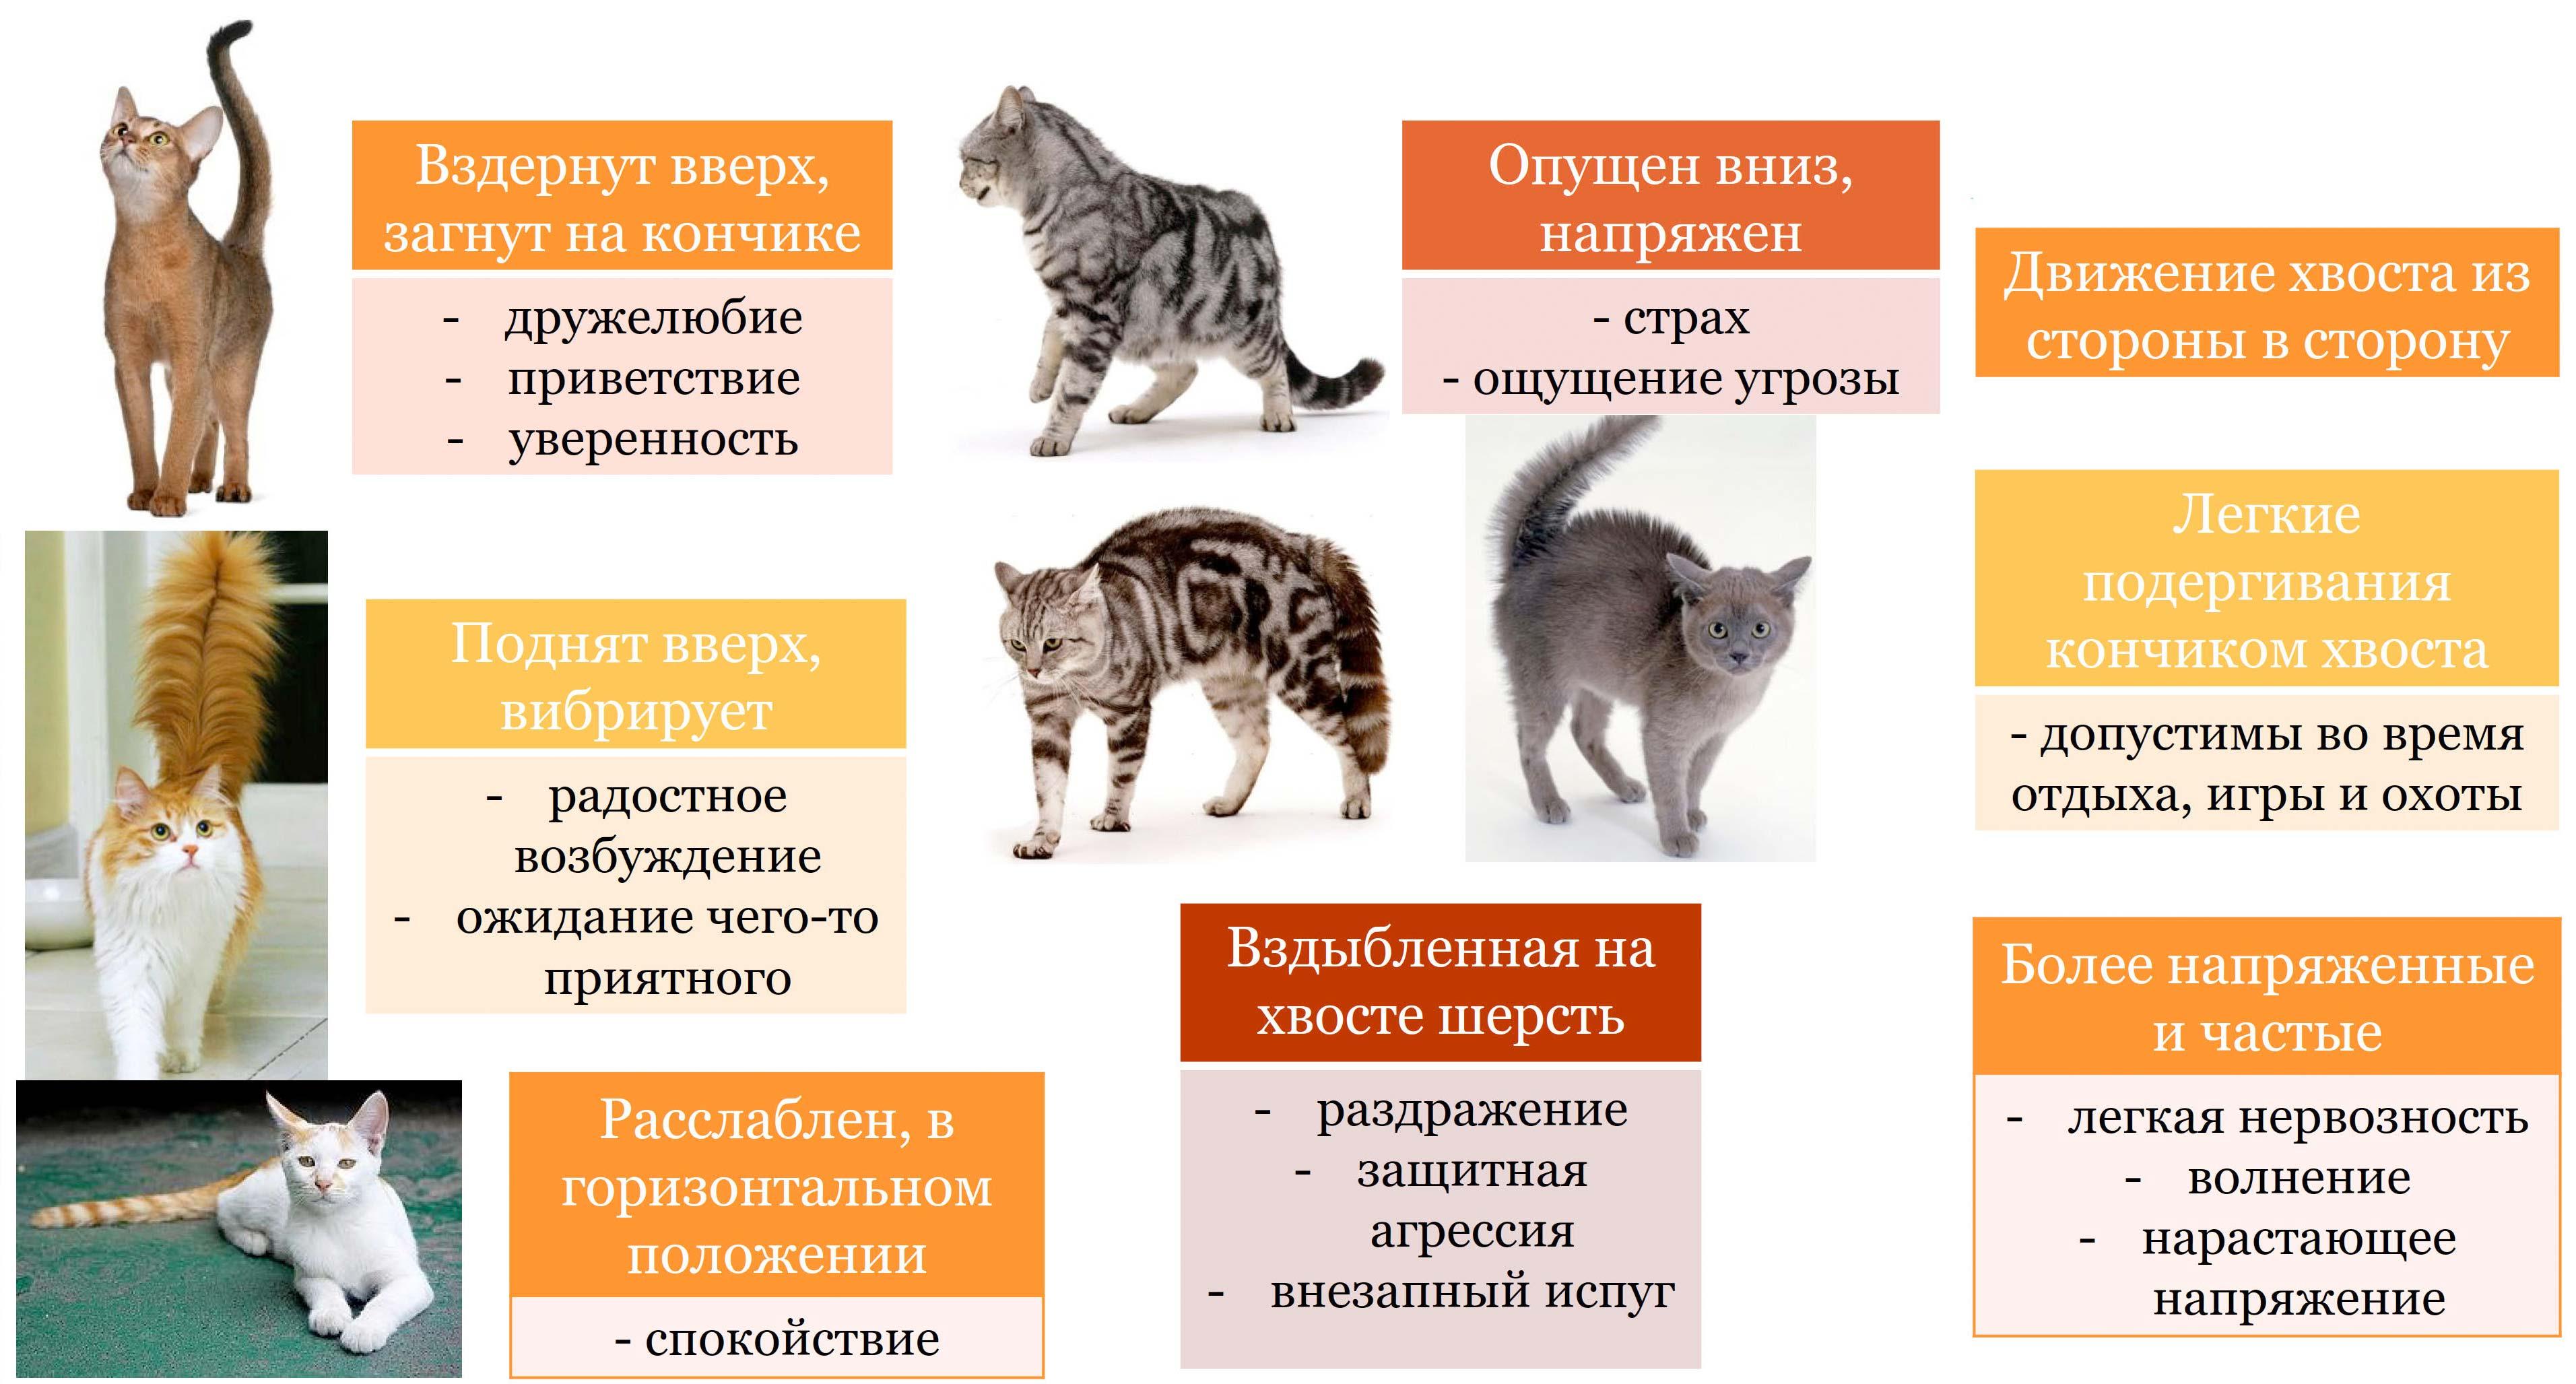 Знаки хвоста у кошек